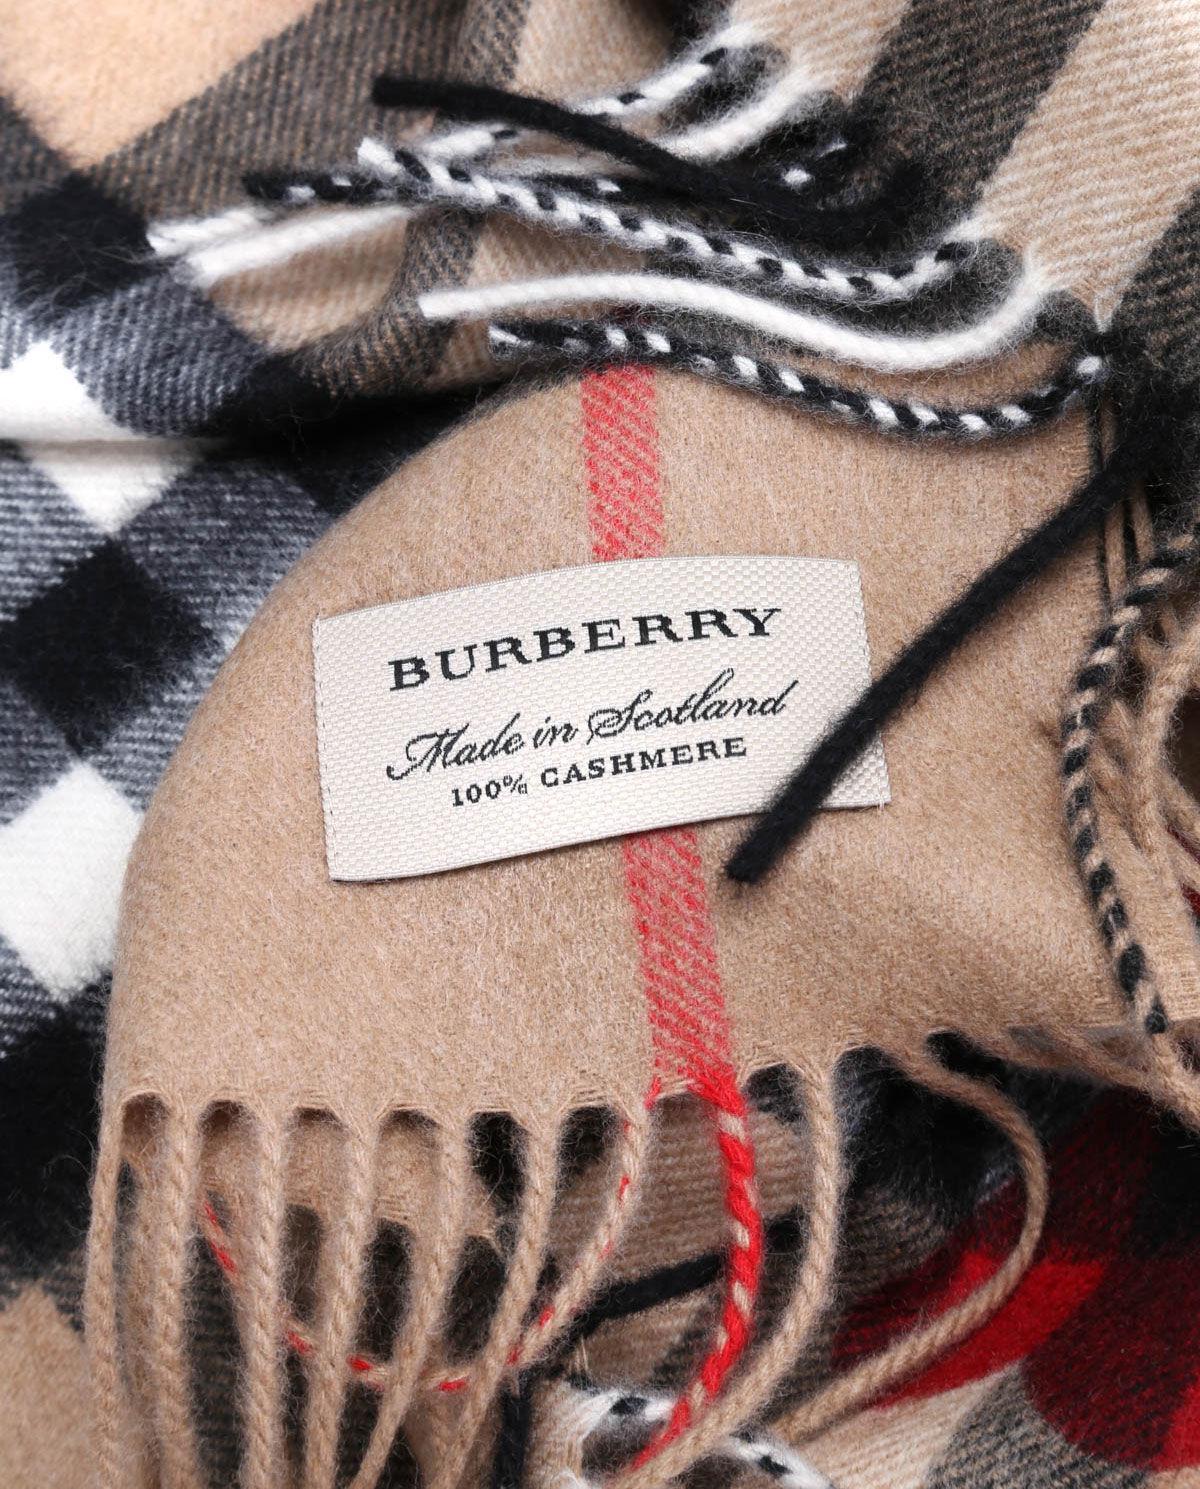 szalik burberry kup teraz najlepsze ceny i opinie. Black Bedroom Furniture Sets. Home Design Ideas